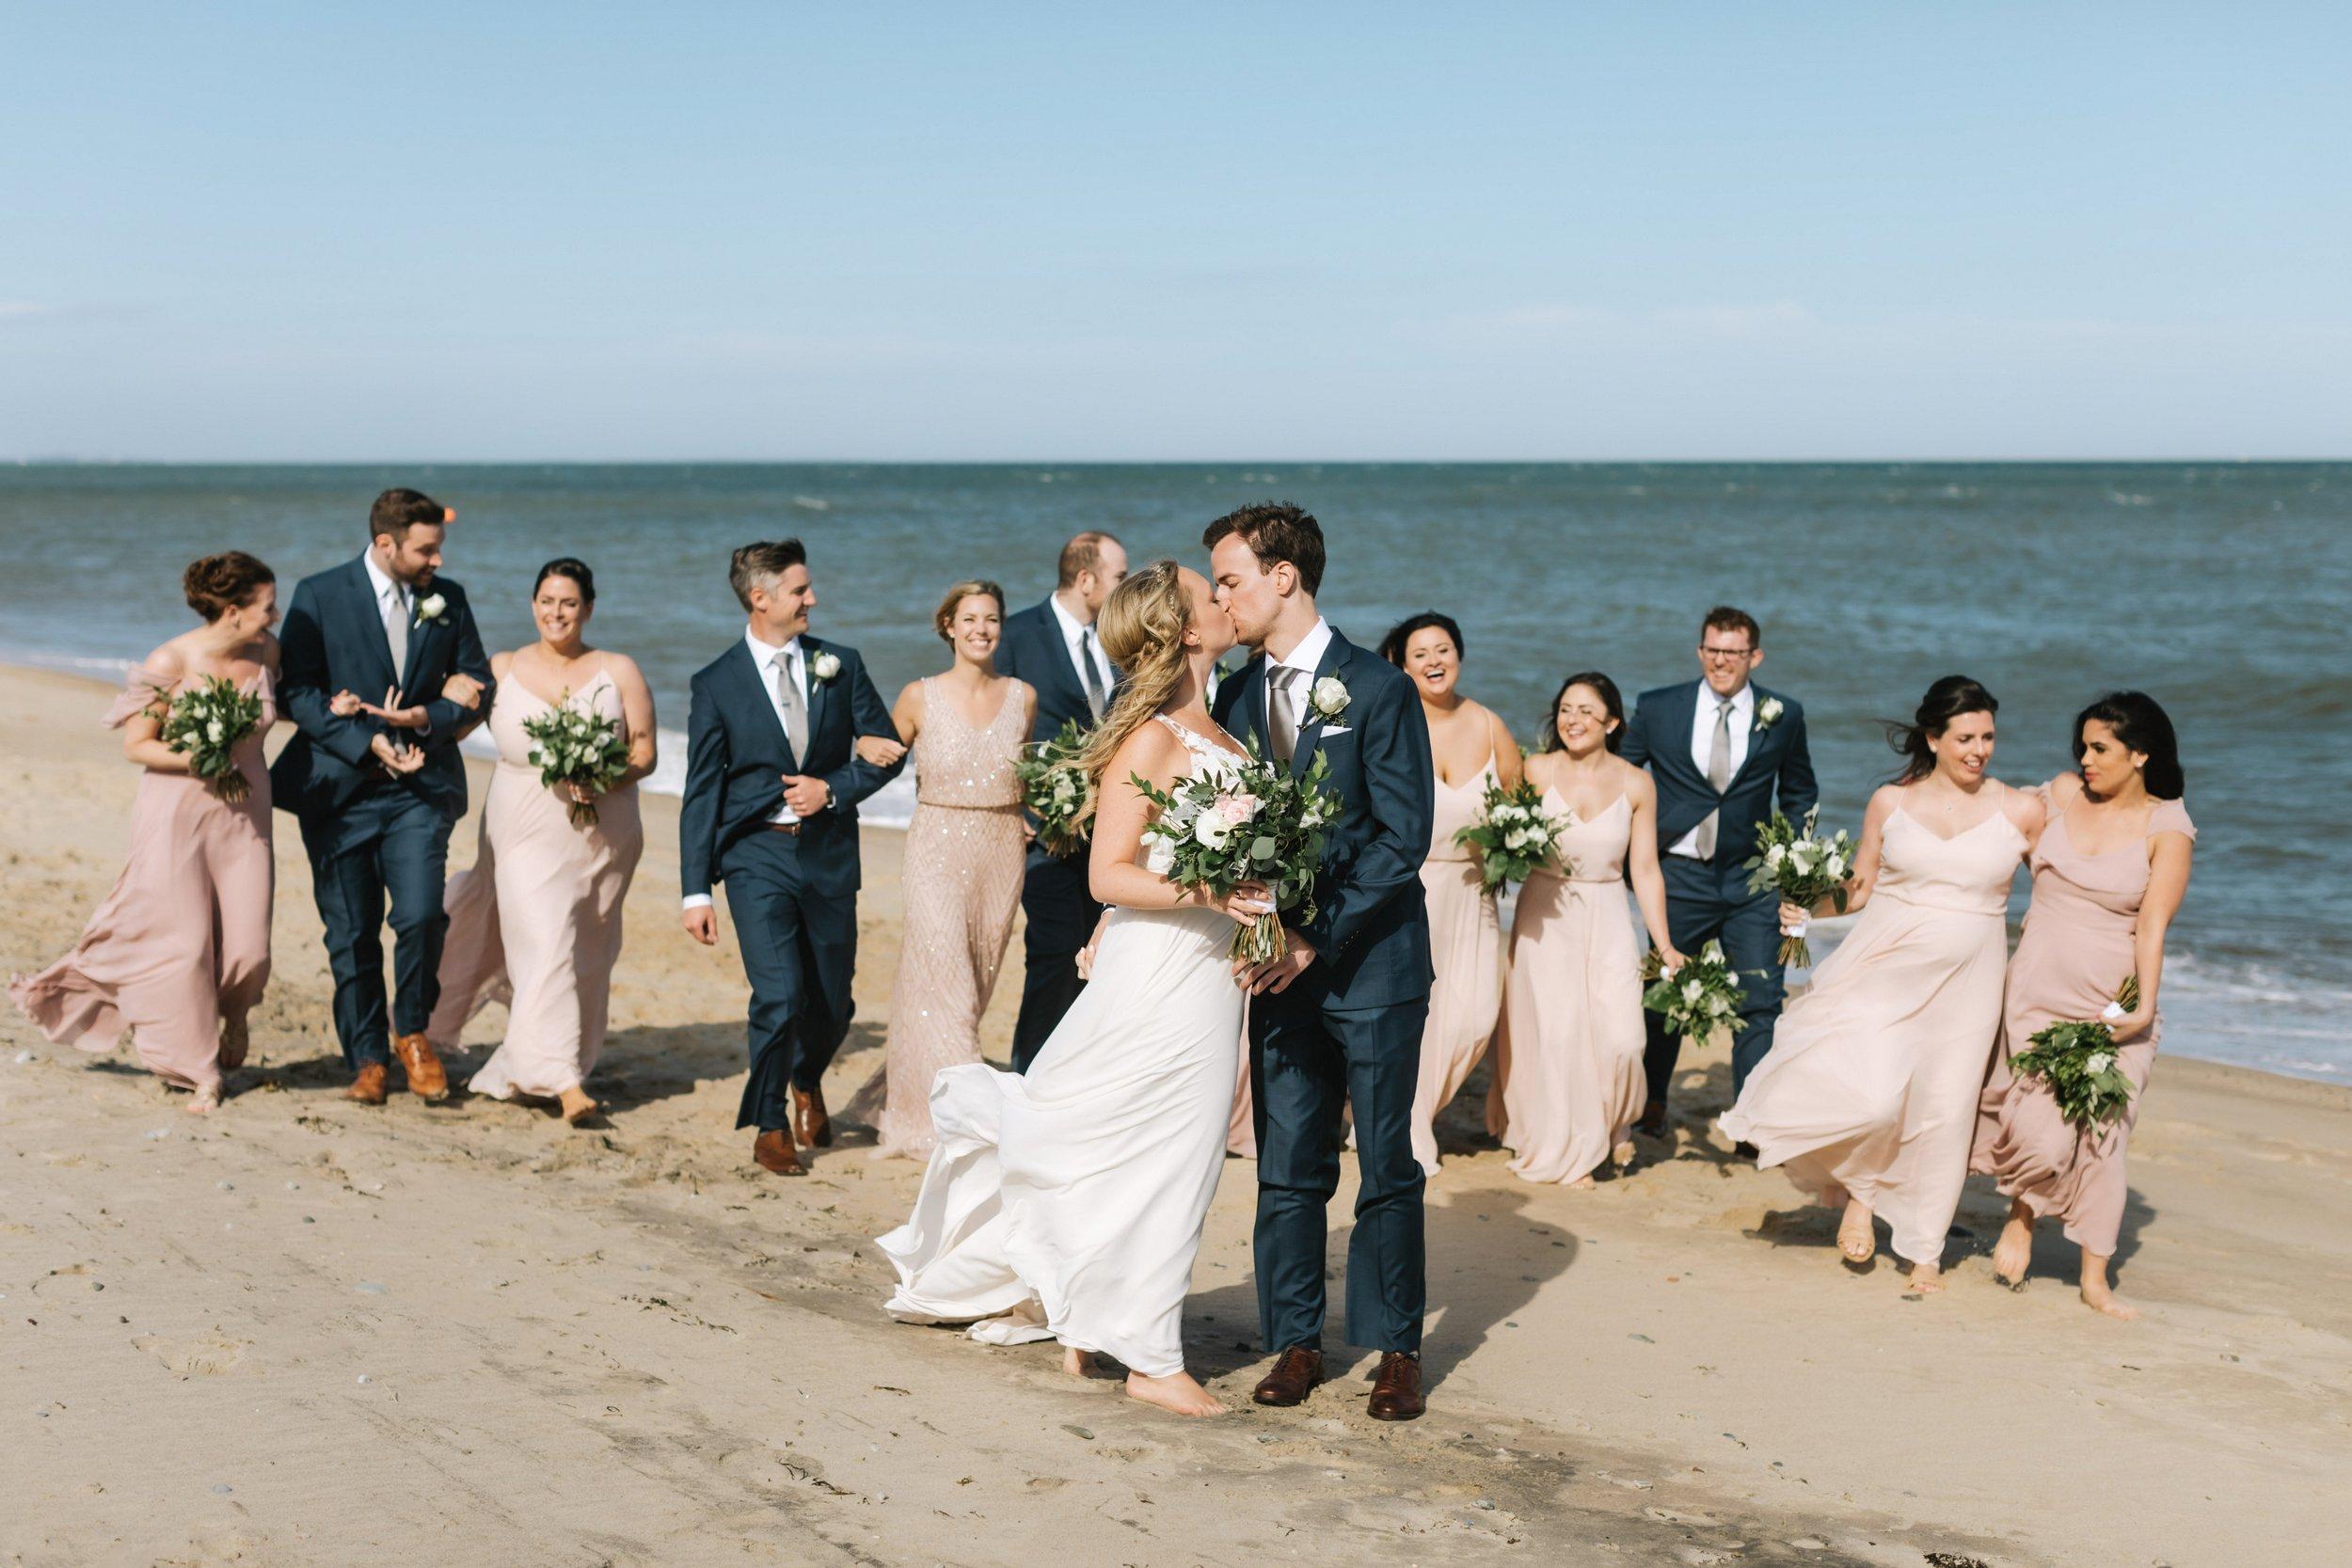 Popponesset-Inn-Wedding-Cape-Cod-Lena-Mirisola-Photography-26.jpg